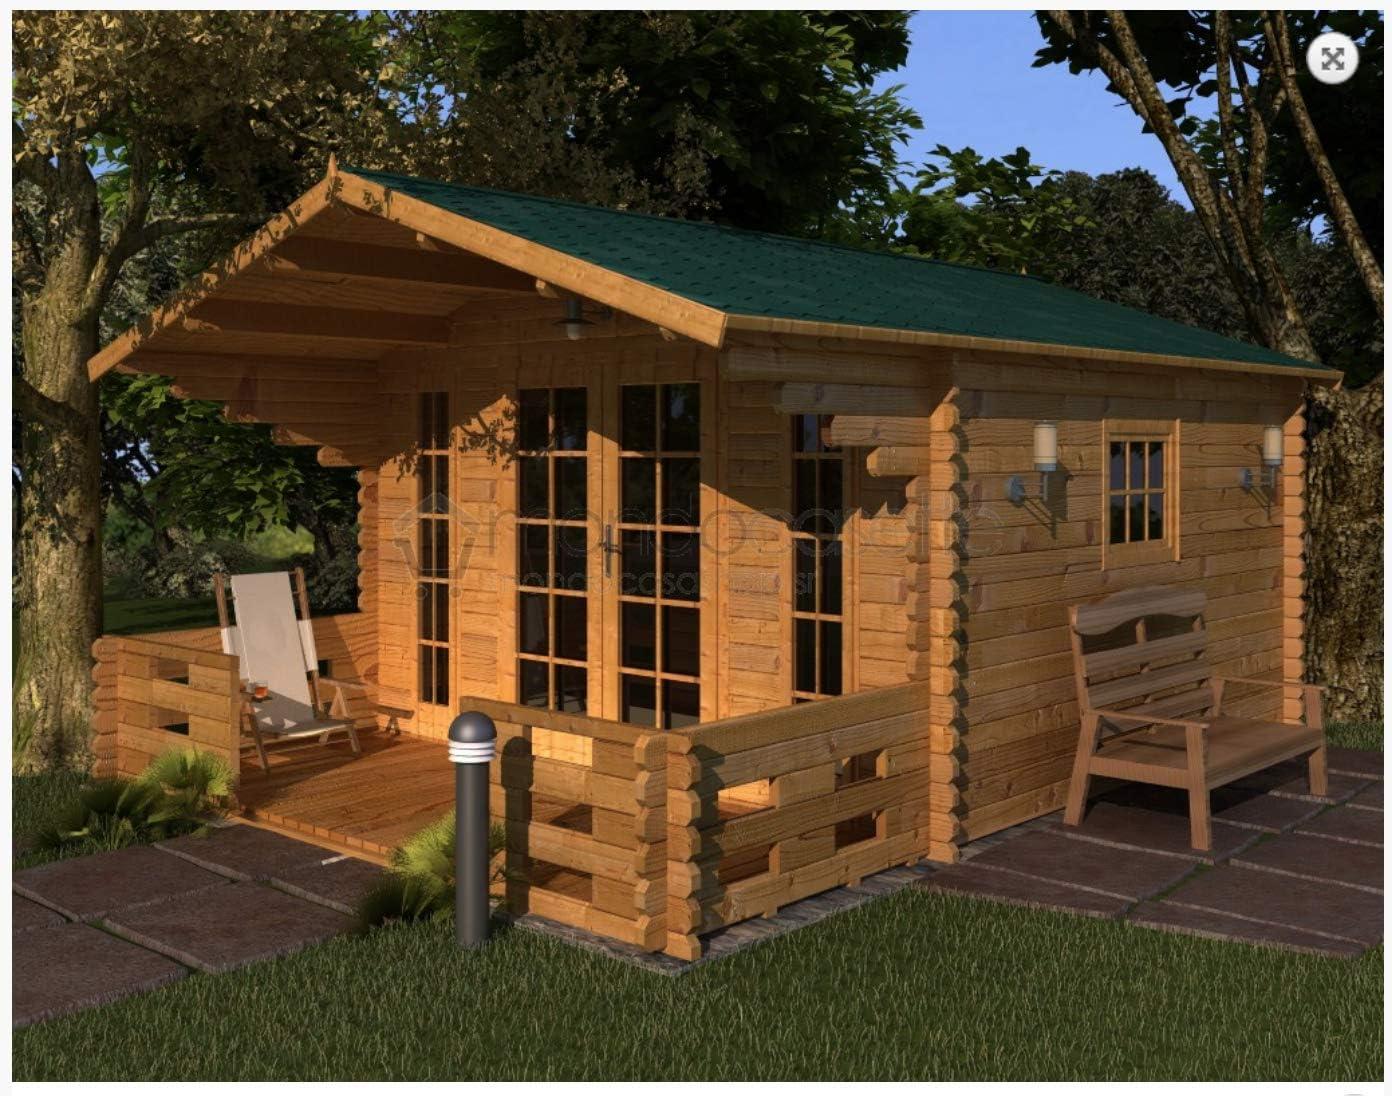 Mondocasette Casa Casa de Madera de jardín – Modelo Milano Grosor Paredes 45 mm 380 x 380 Cm, ripostiglio Box legnaia: Amazon.es: Jardín